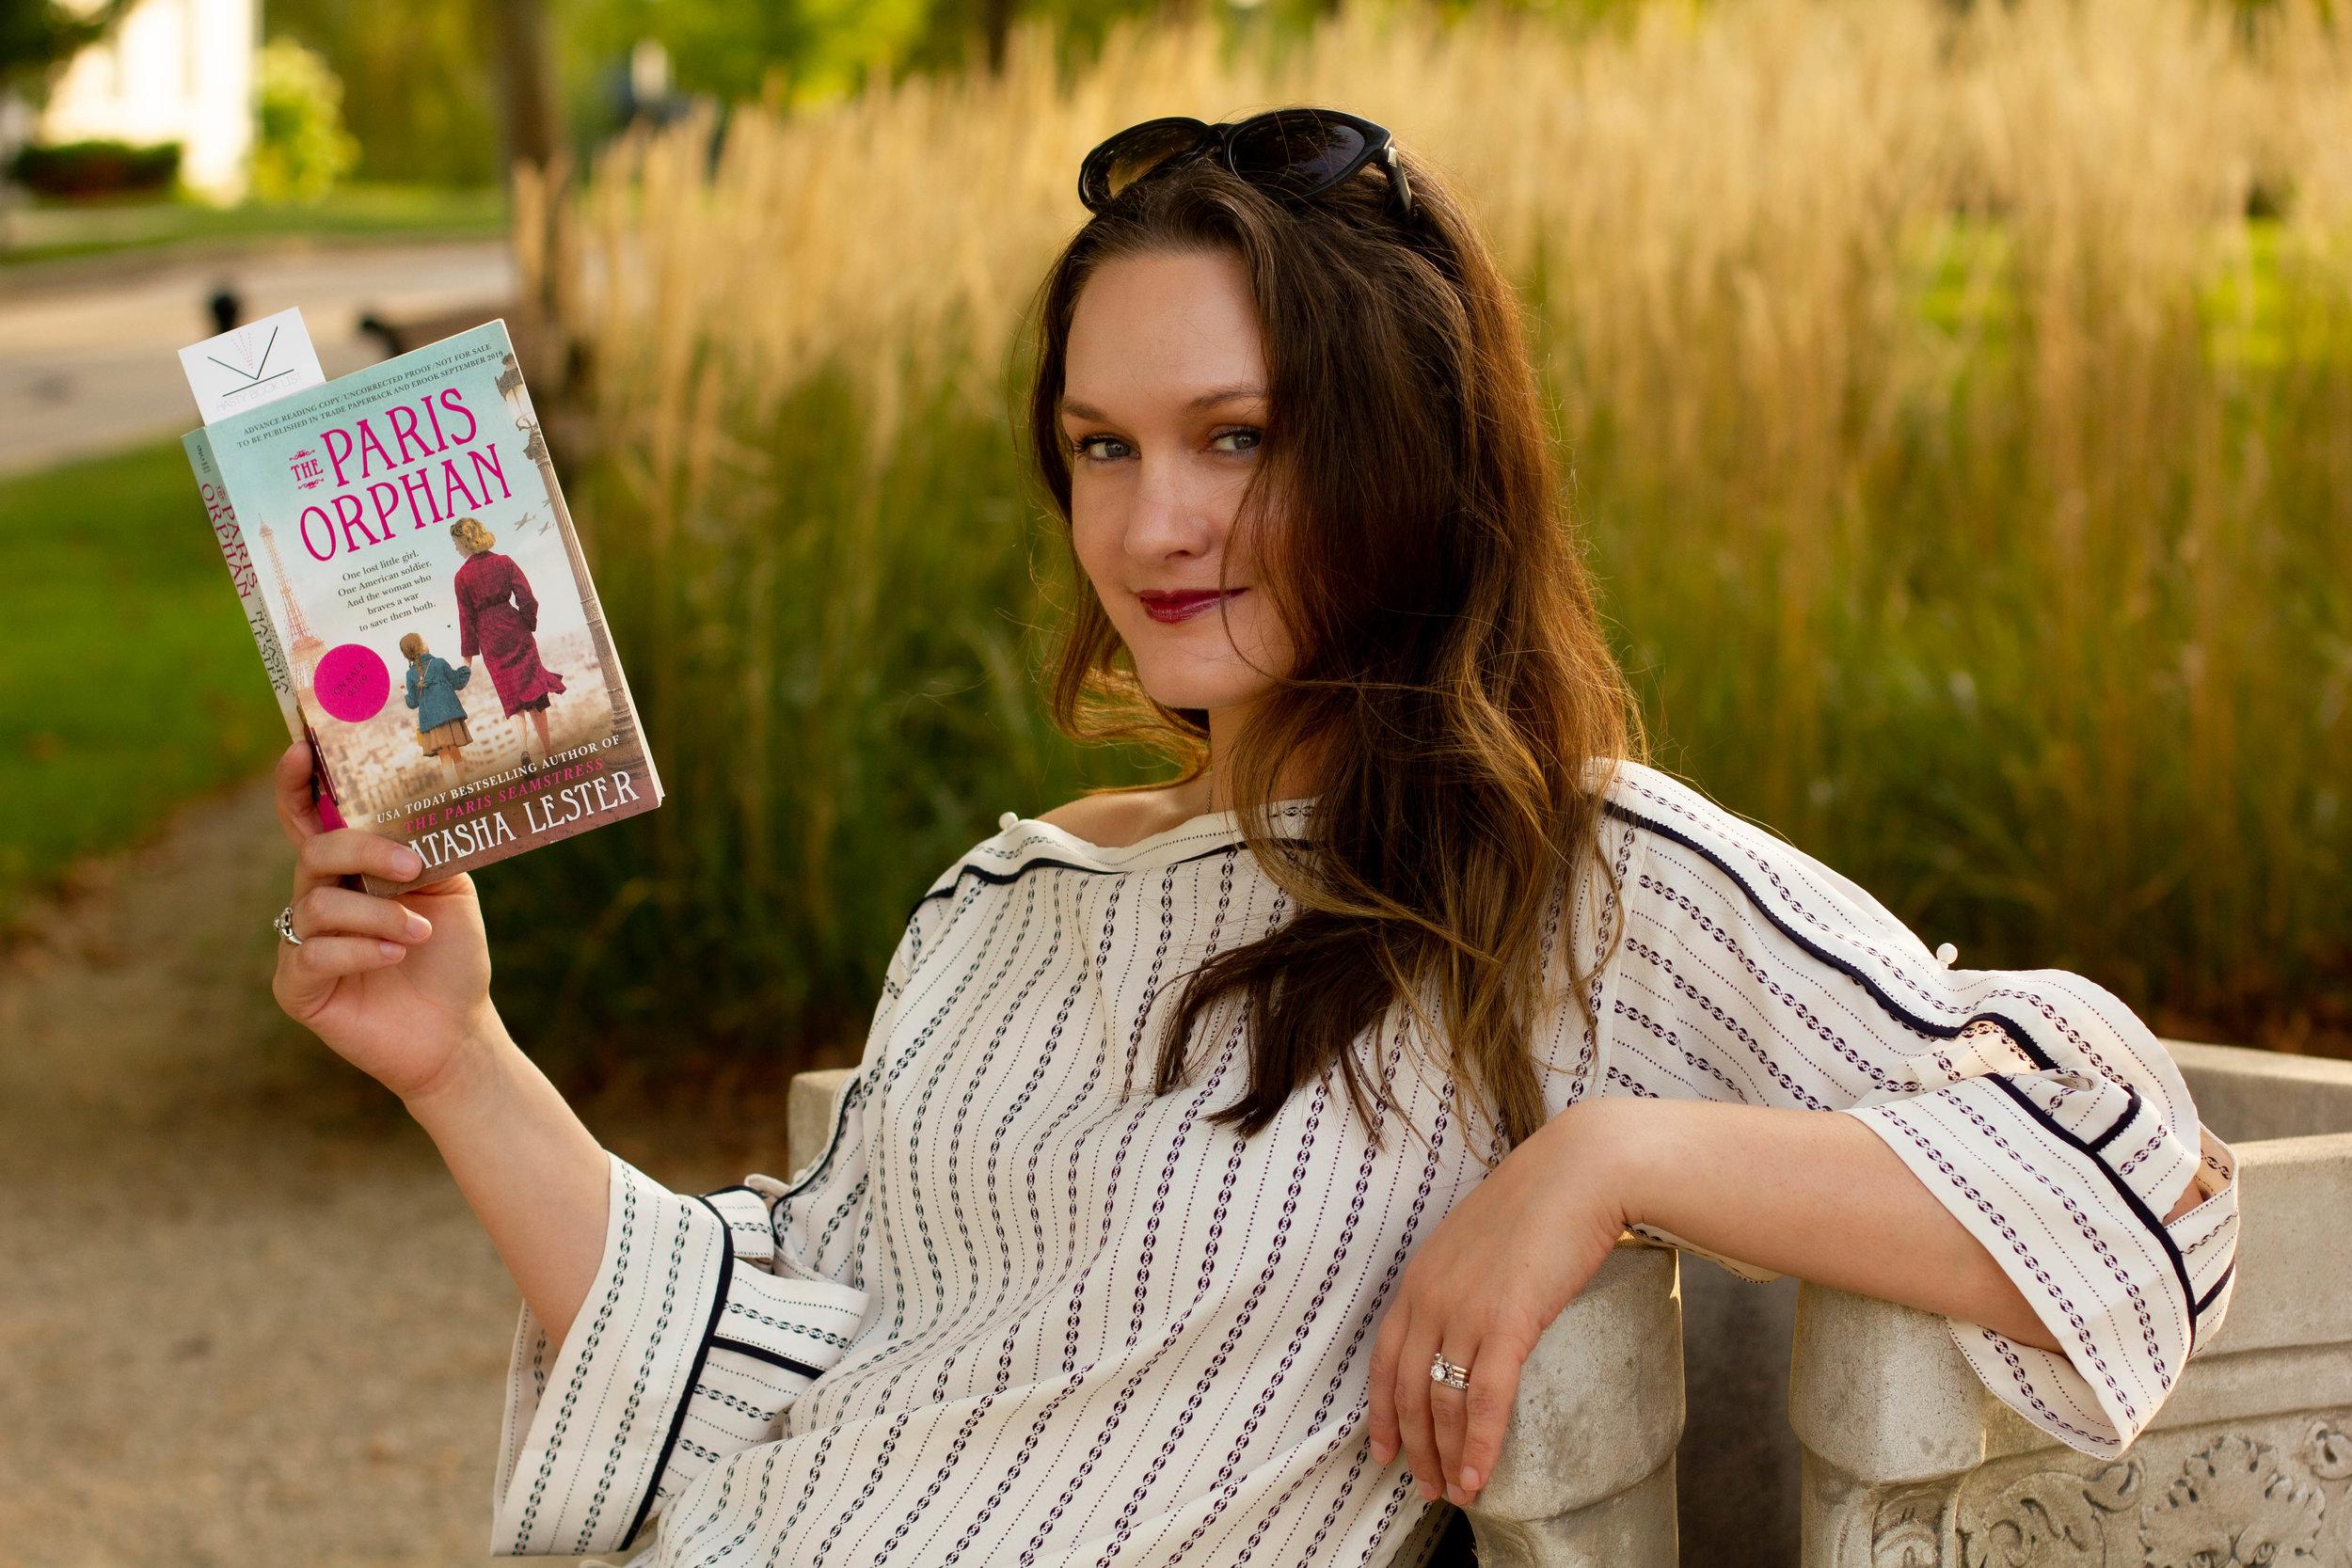 Book Review - The Paris Orphan by Natasha Lester